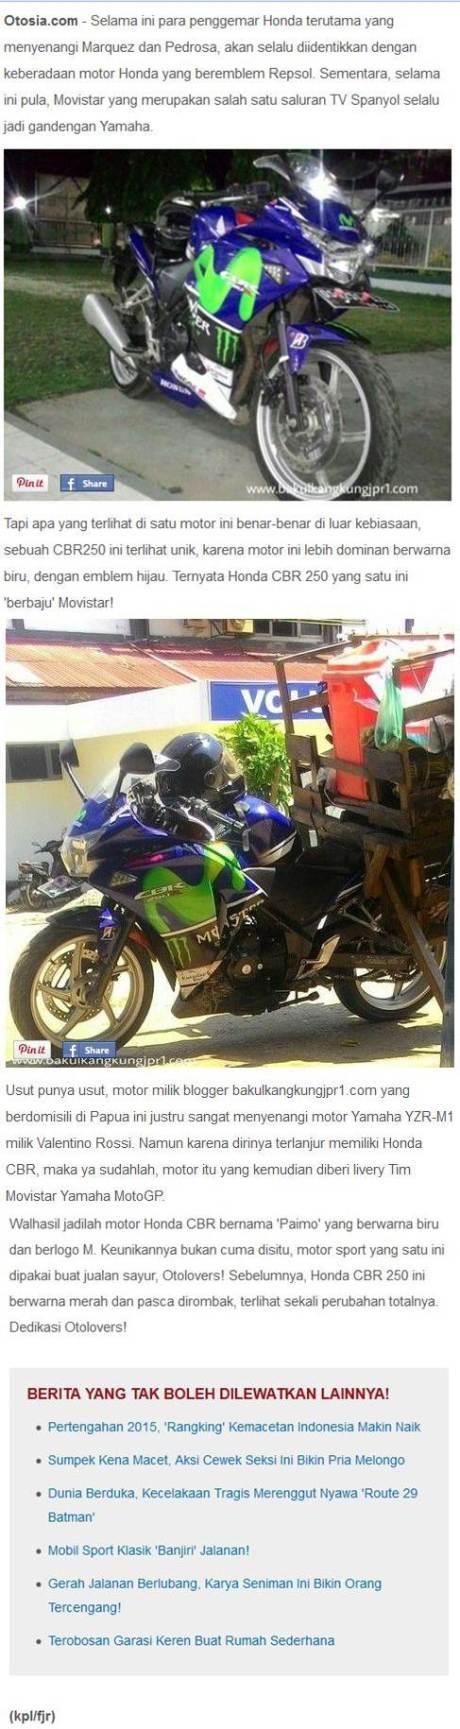 Otosia sebut Honda CBR250R modif Movistar karena Tak Keturutan Beli Yamaha R25, Pemilik Keberatan 4